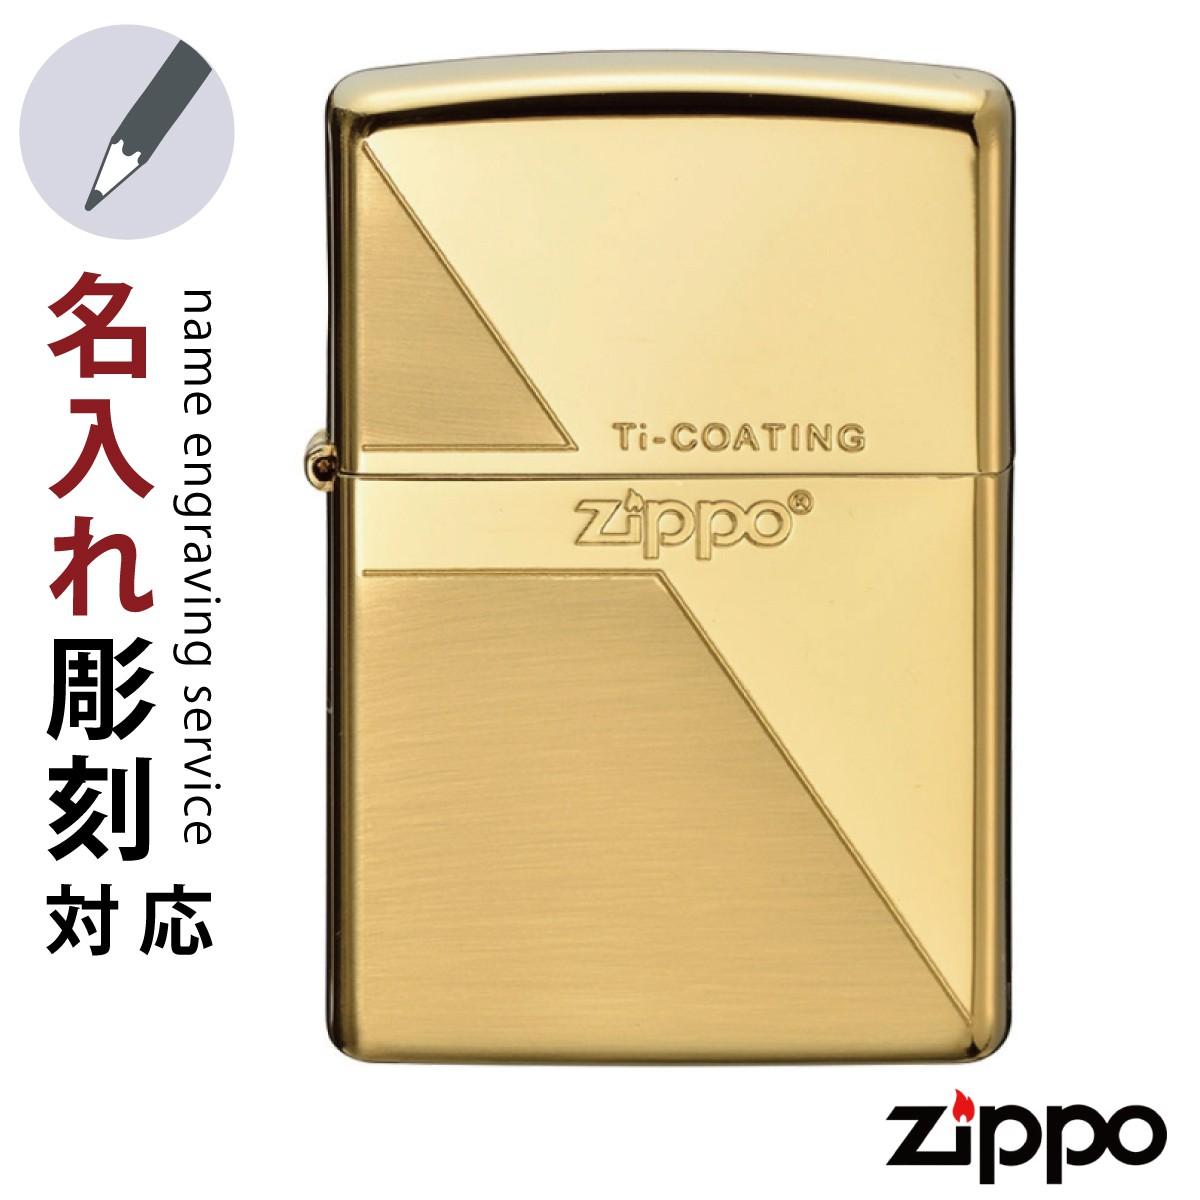 zippo ジッポー ライター Zippoライター ジッポライター 金チタンZ #1 名入れ ギフト